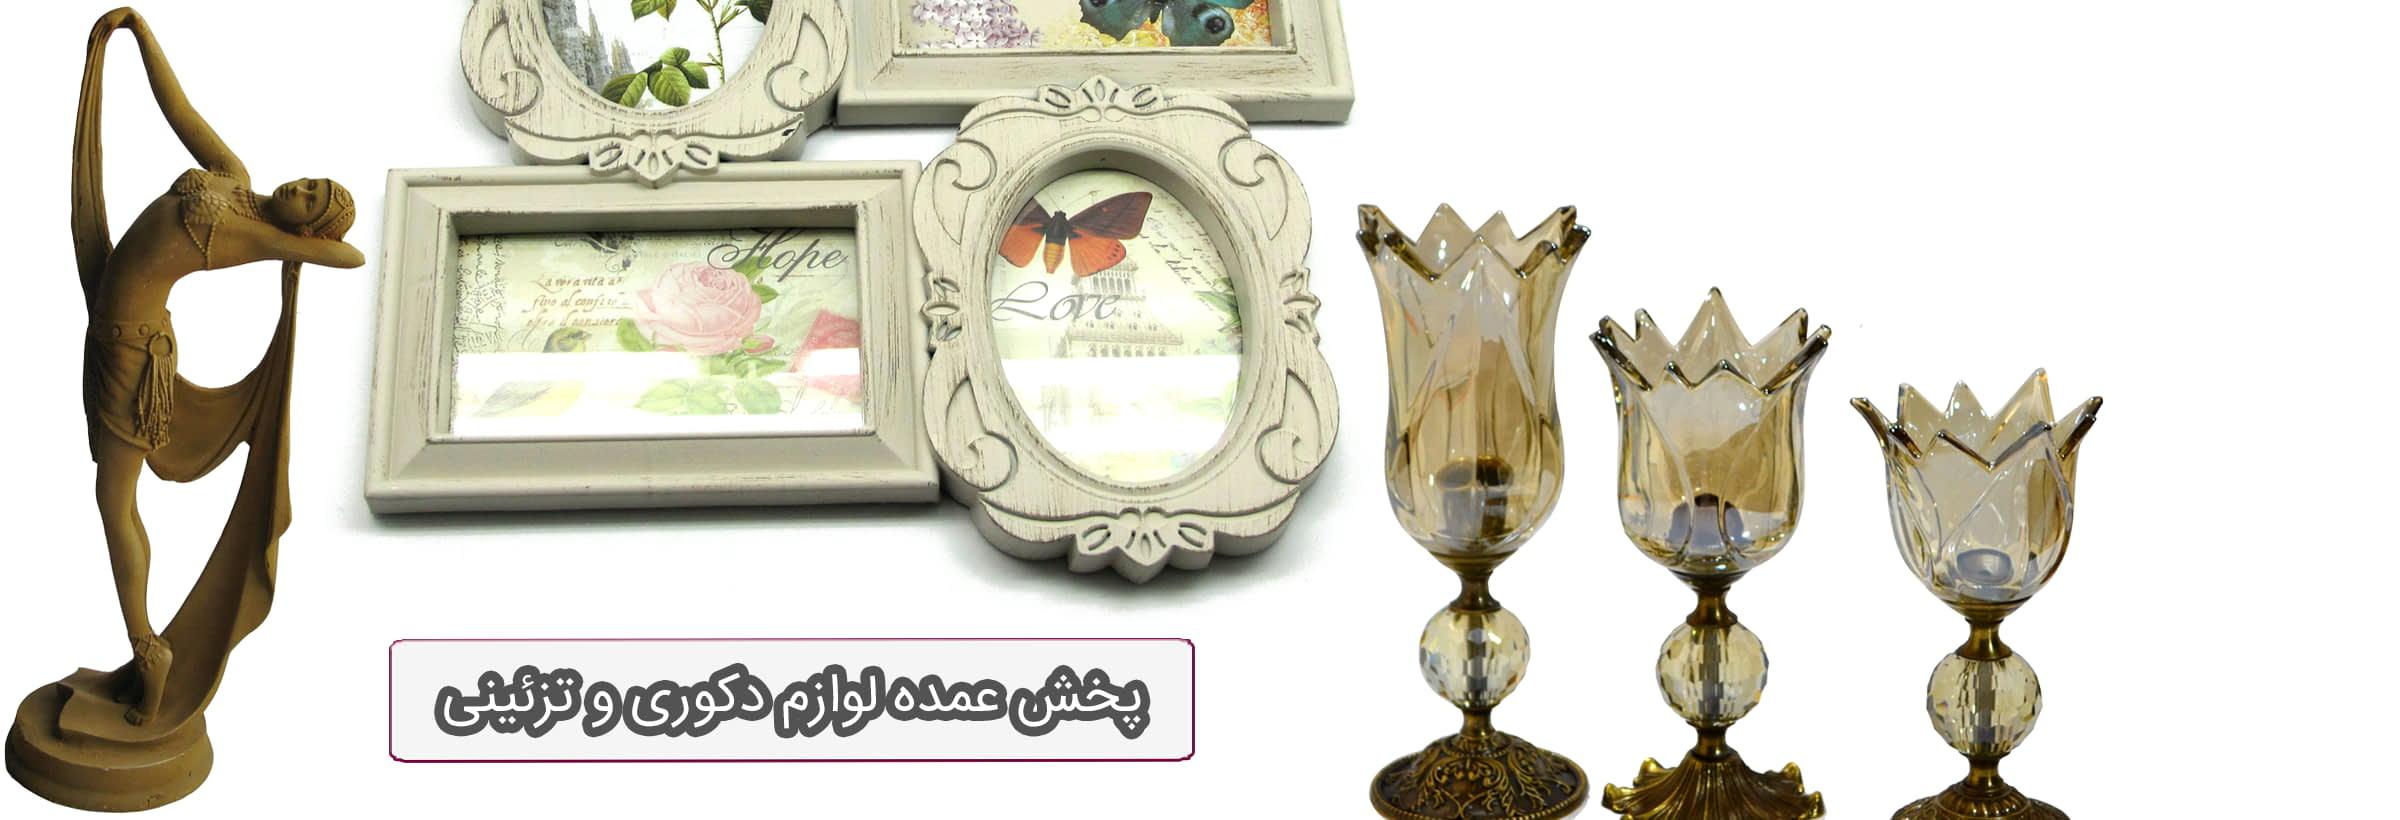 پخش عمده لوازم دکوری و تزئینی صالح آباد